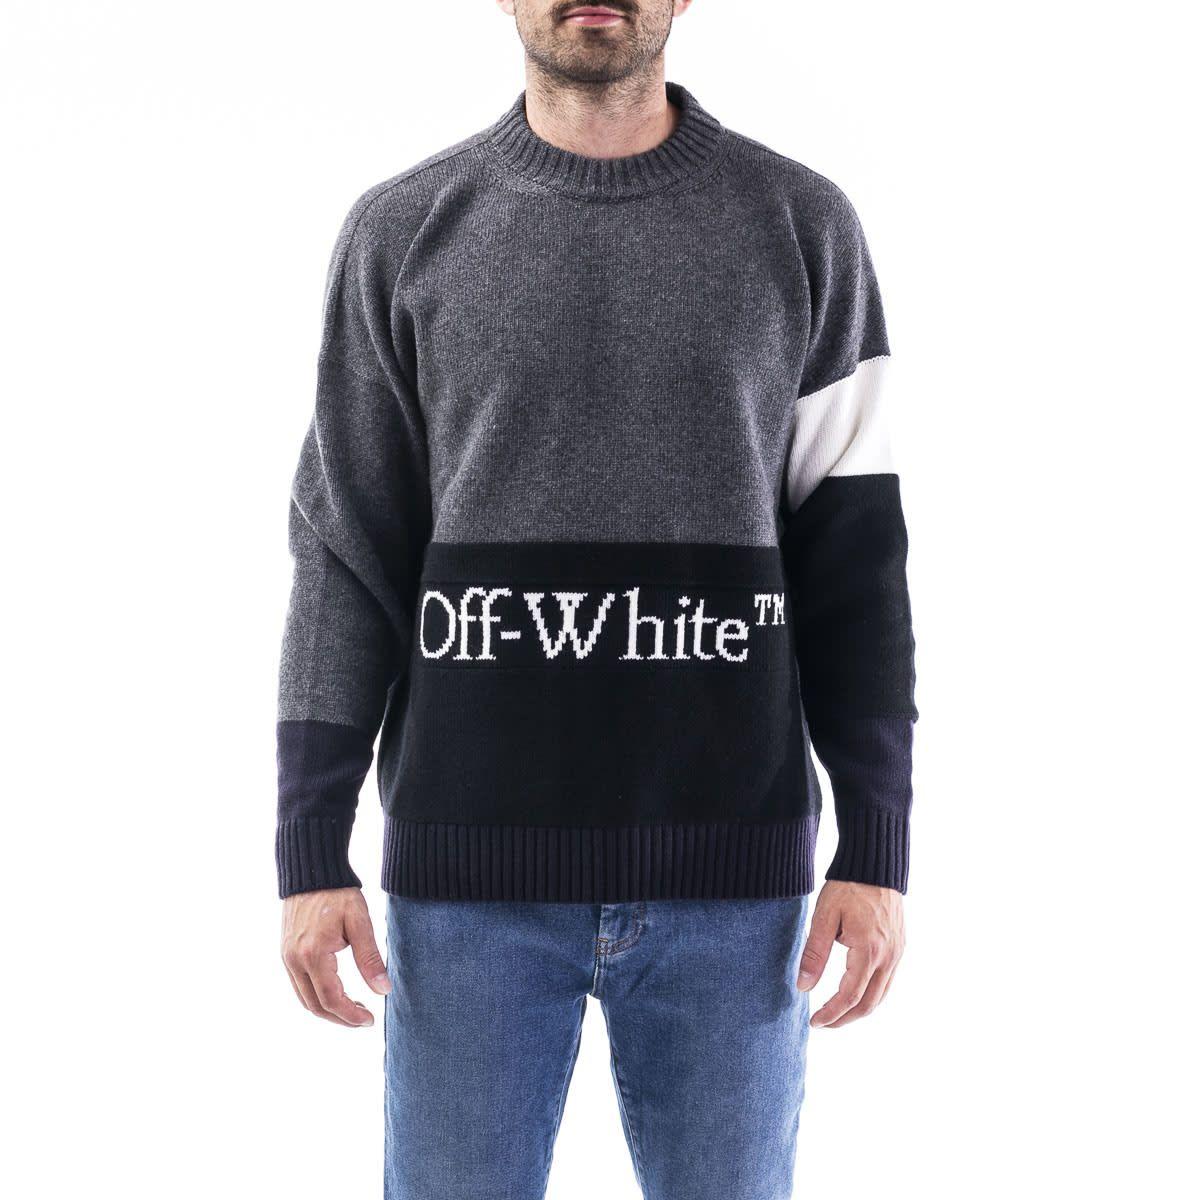 Off White Virgin Wool Sweater Sweaters Wool Sweaters Hooded Shirt [ 1200 x 1200 Pixel ]